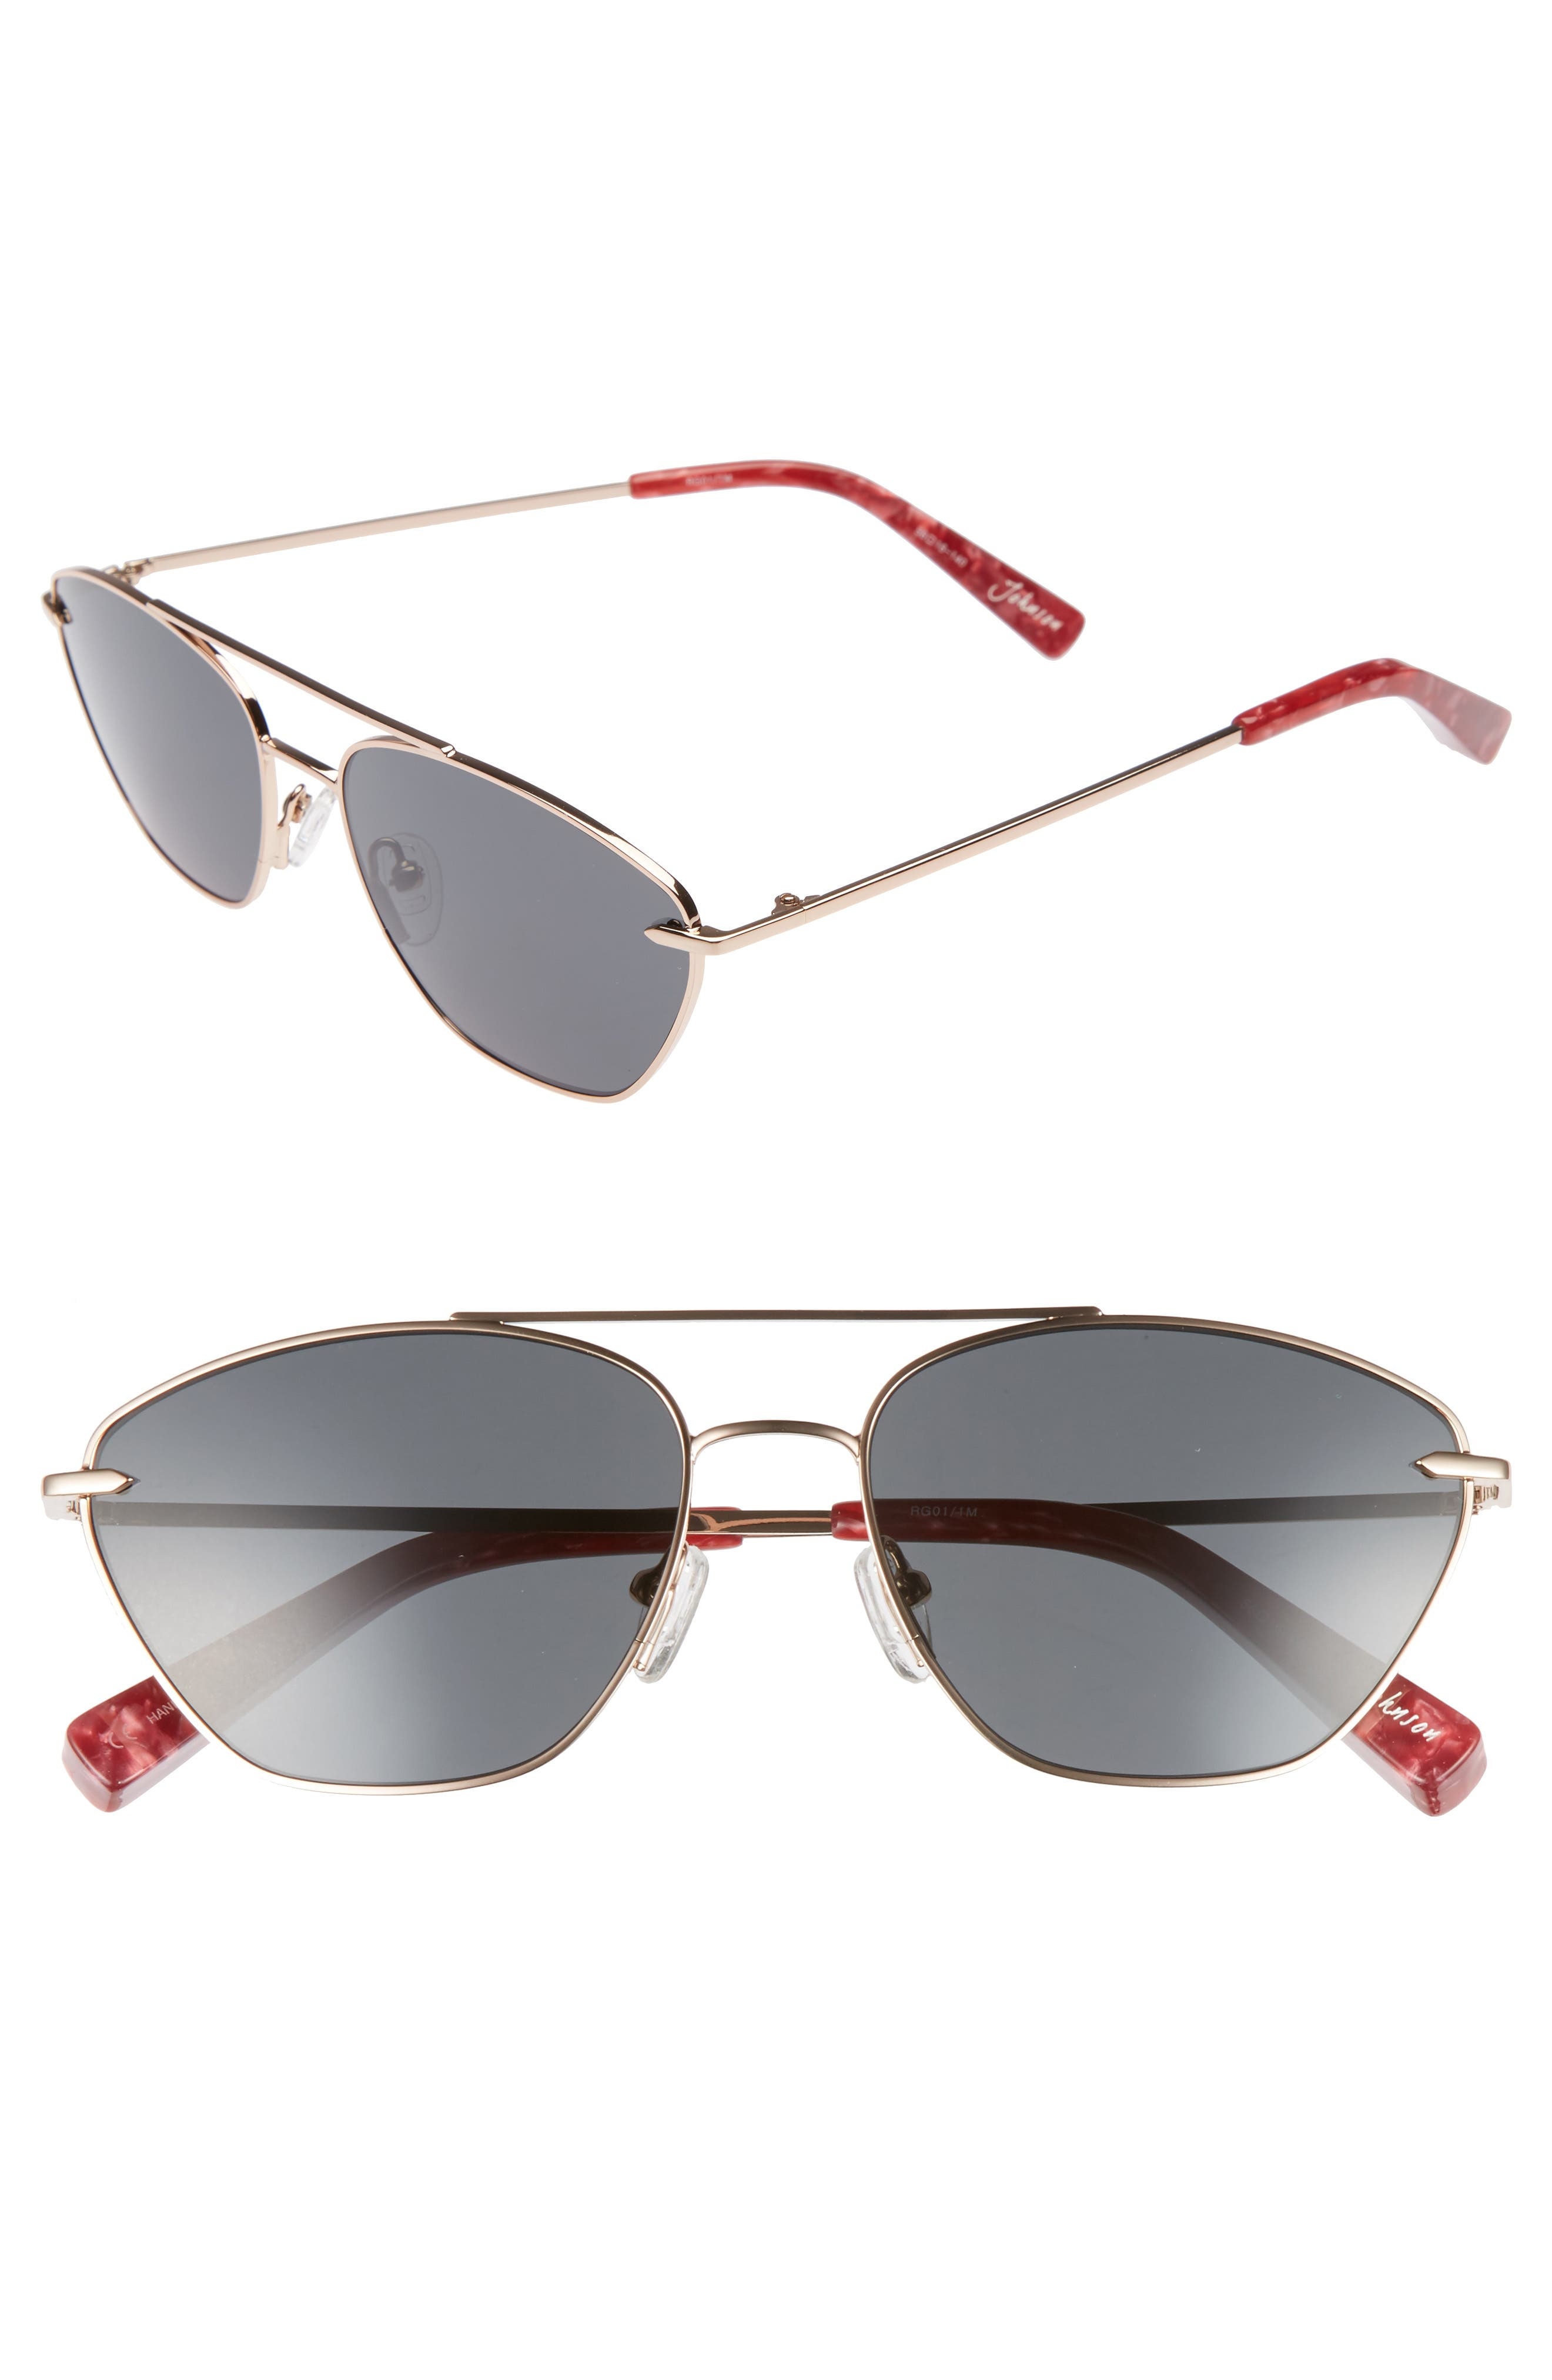 Johnson 56mm Navigator Sunglasses,                             Main thumbnail 1, color,                             Rose Gold/ Smoke